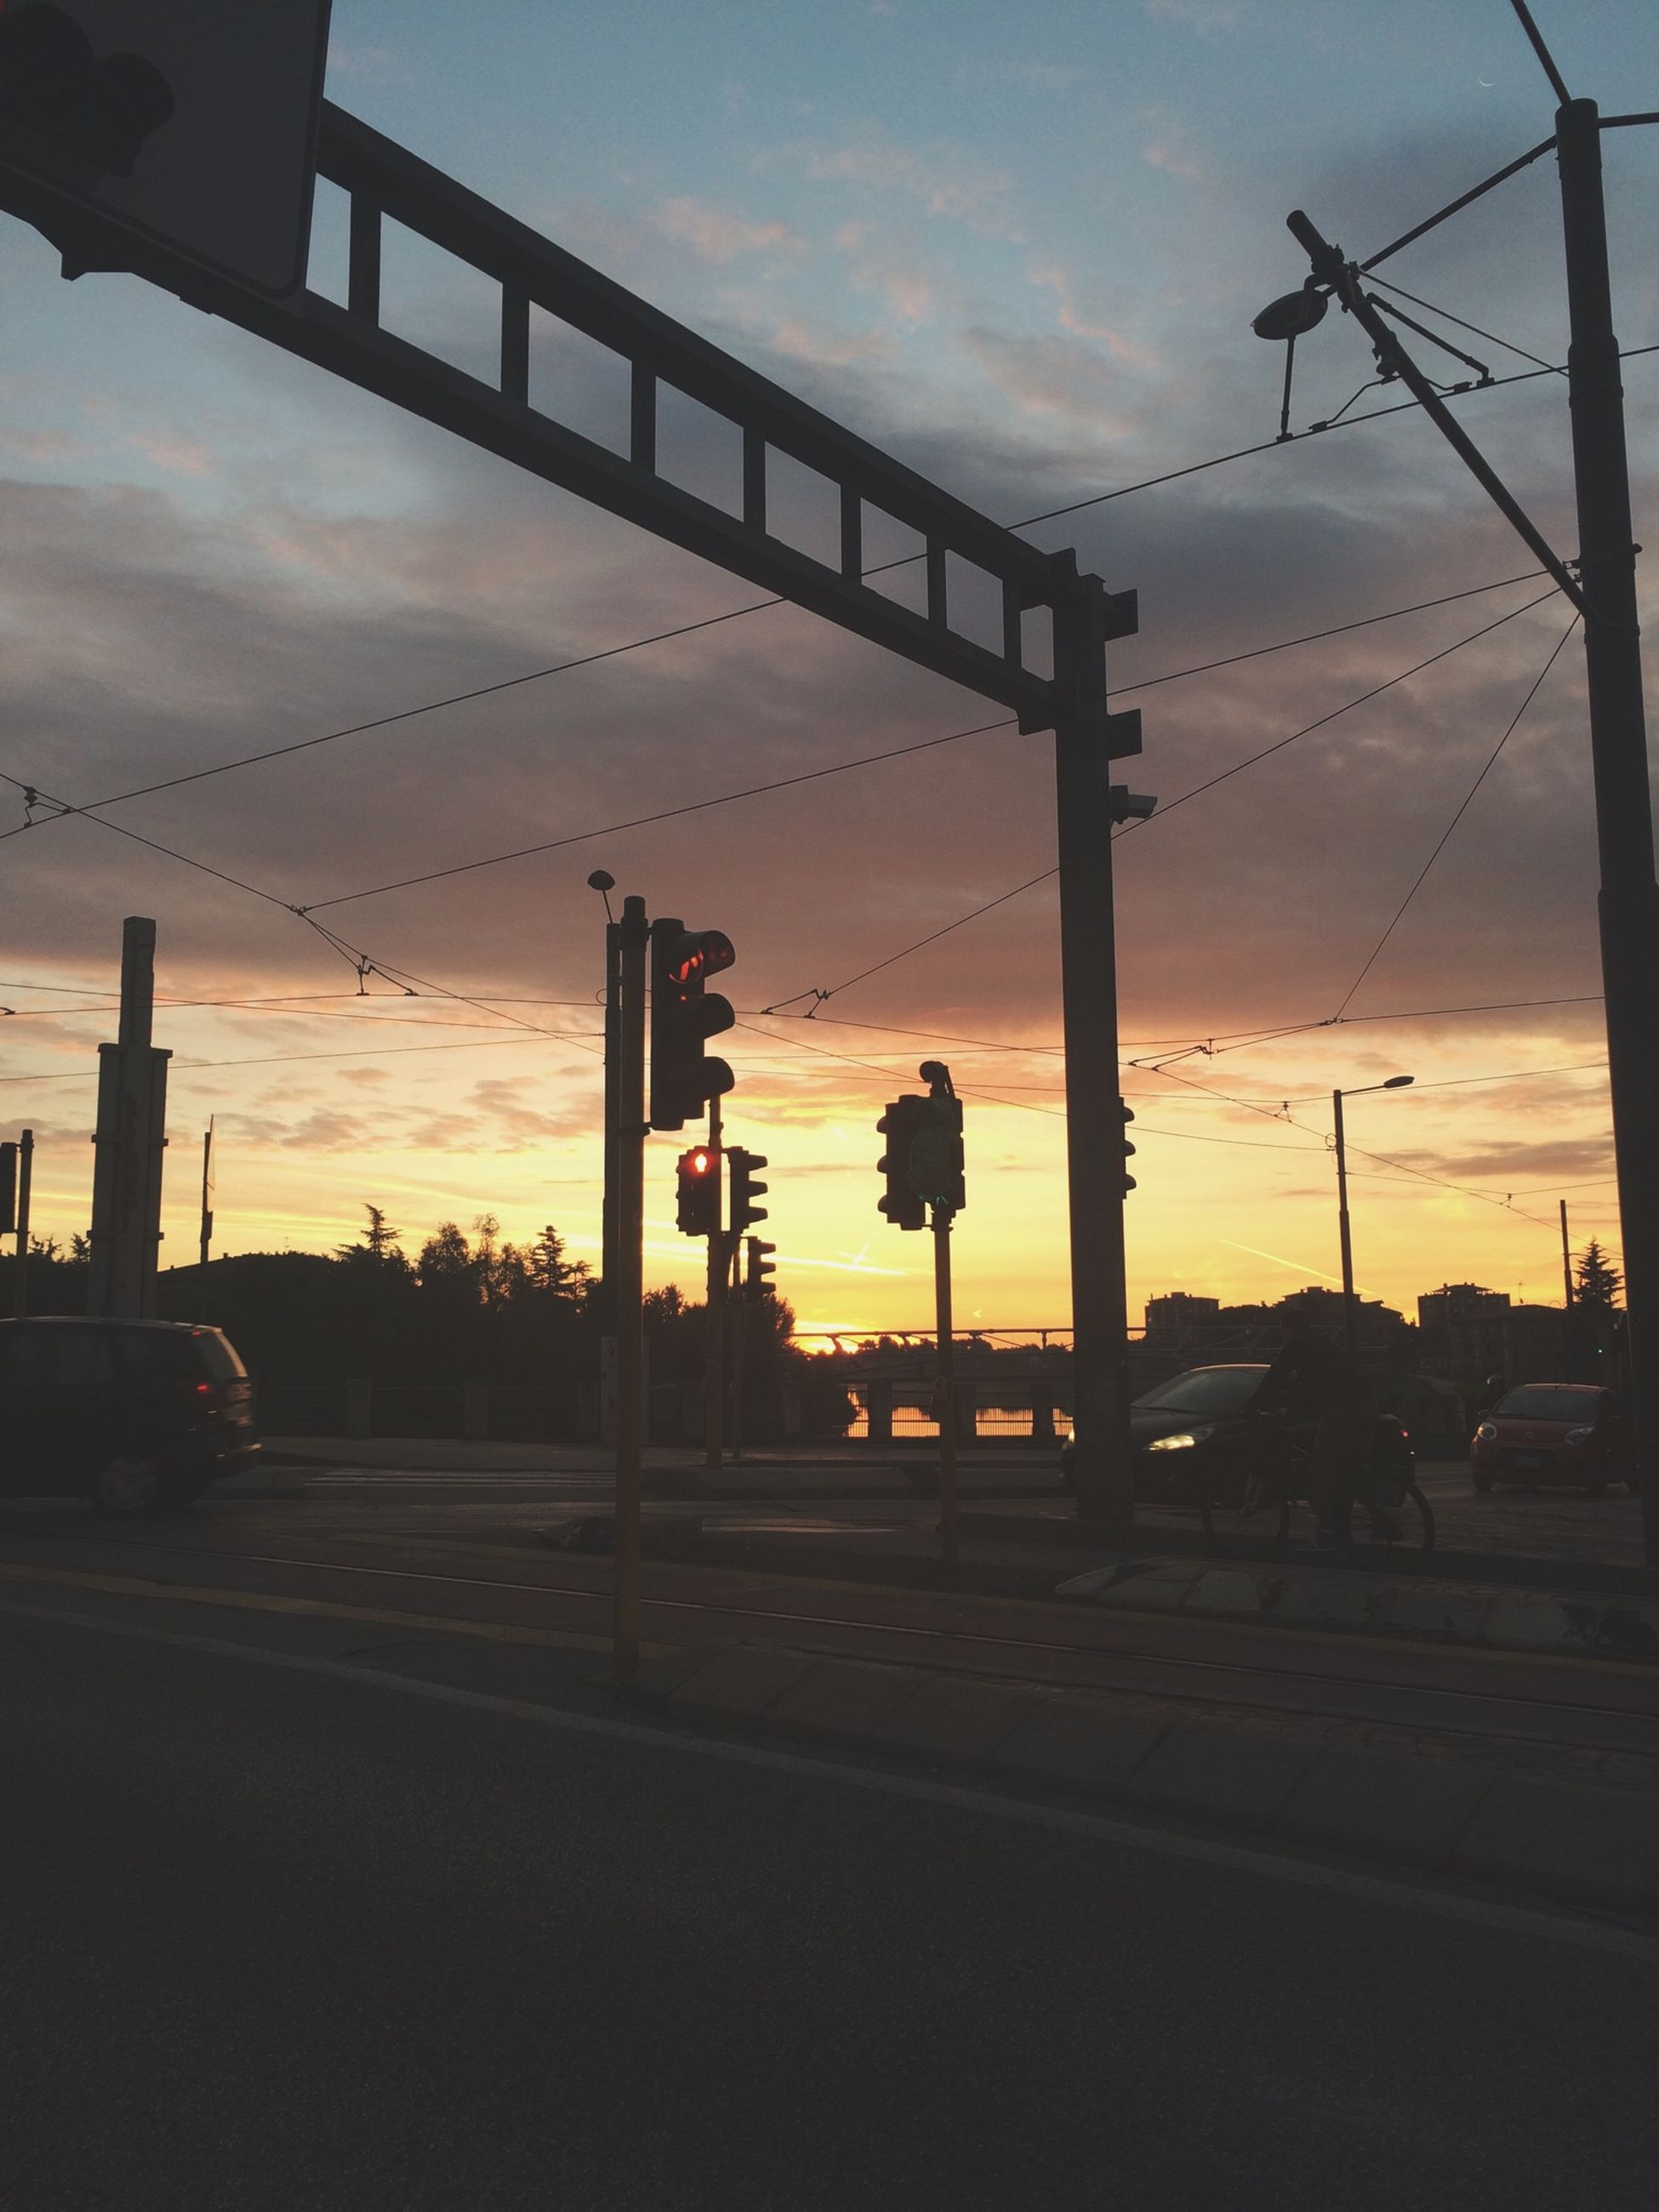 sunset, sky, built structure, architecture, transportation, street light, cloud - sky, silhouette, building exterior, street, road, cloud, orange color, the way forward, power line, electricity pylon, outdoors, connection, dusk, city